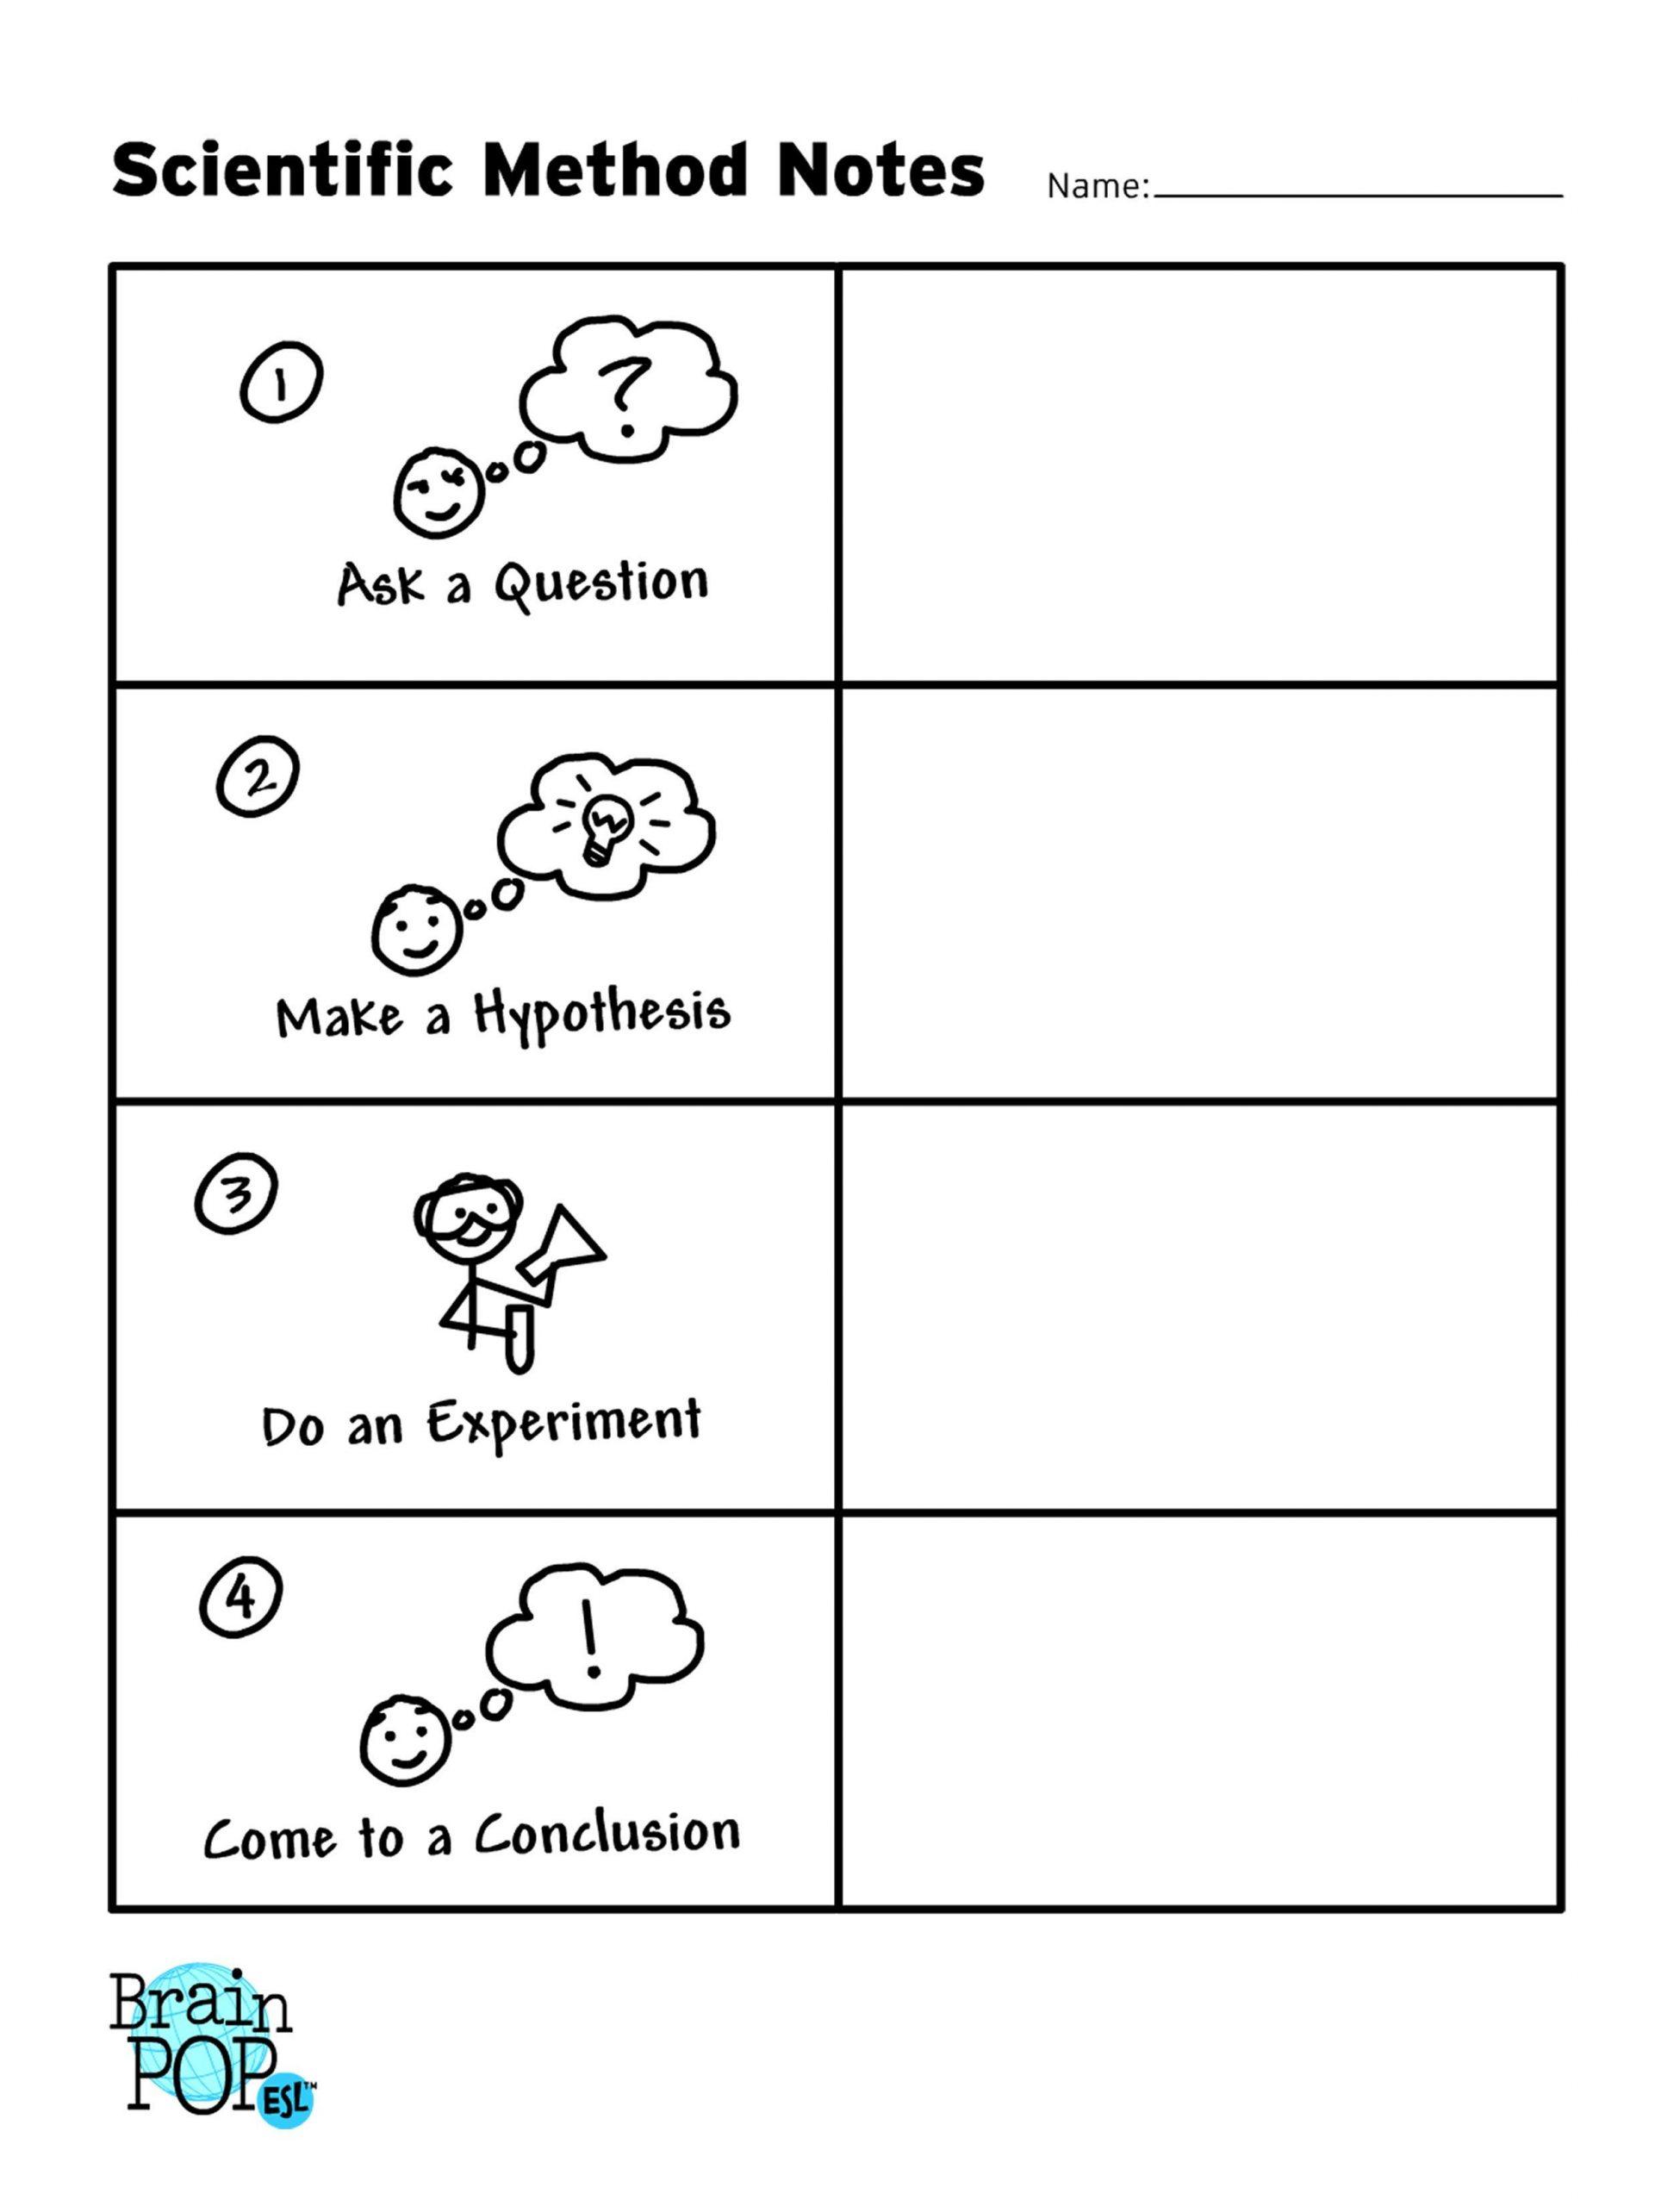 Scientific Method Worksheet 4th Grade Scientific Method Vocabulary Worksheet Answers Valid